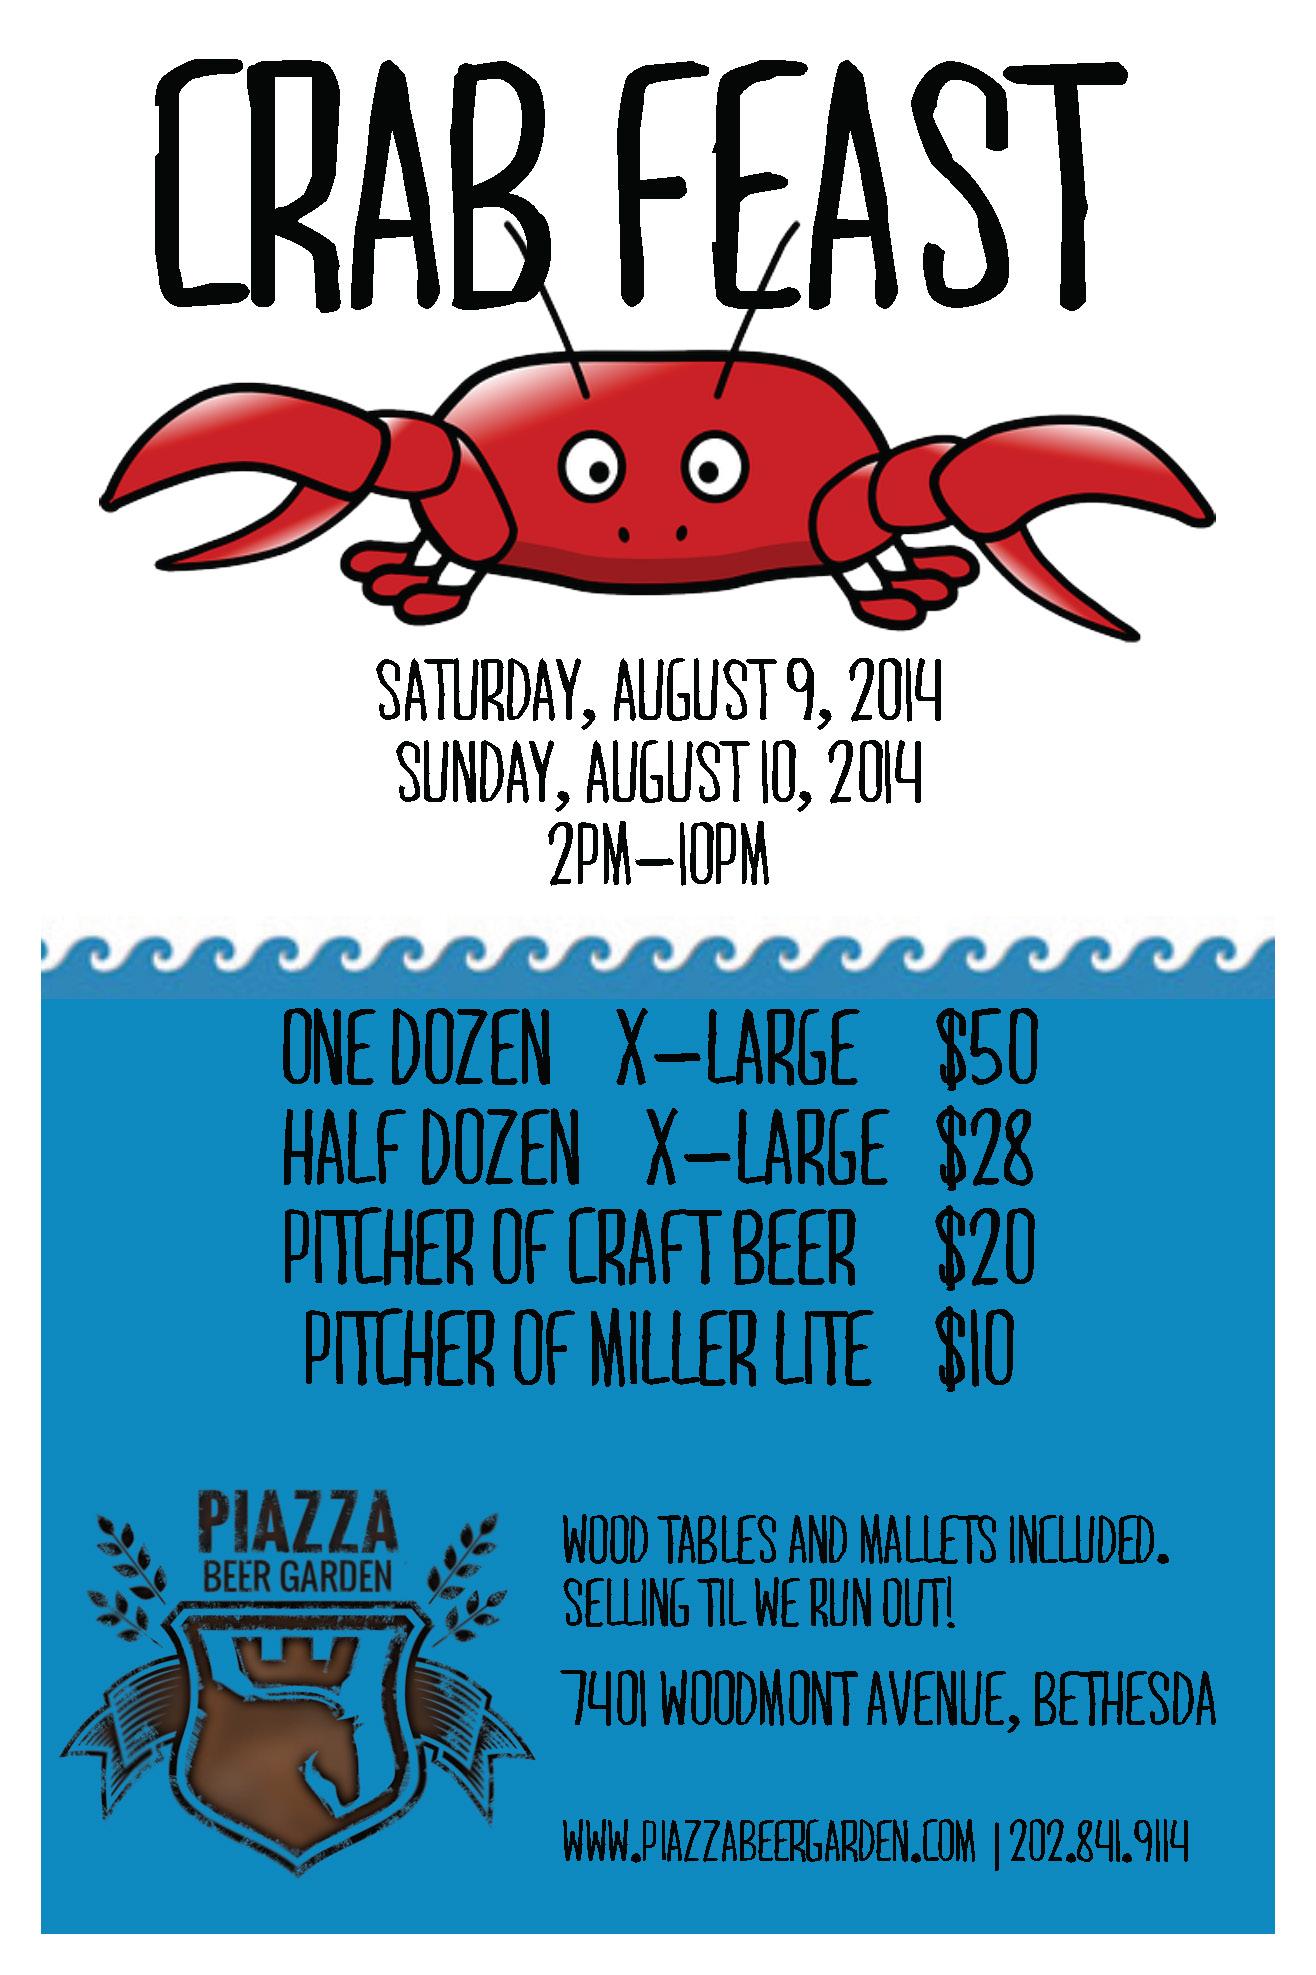 crabfeast_flyer